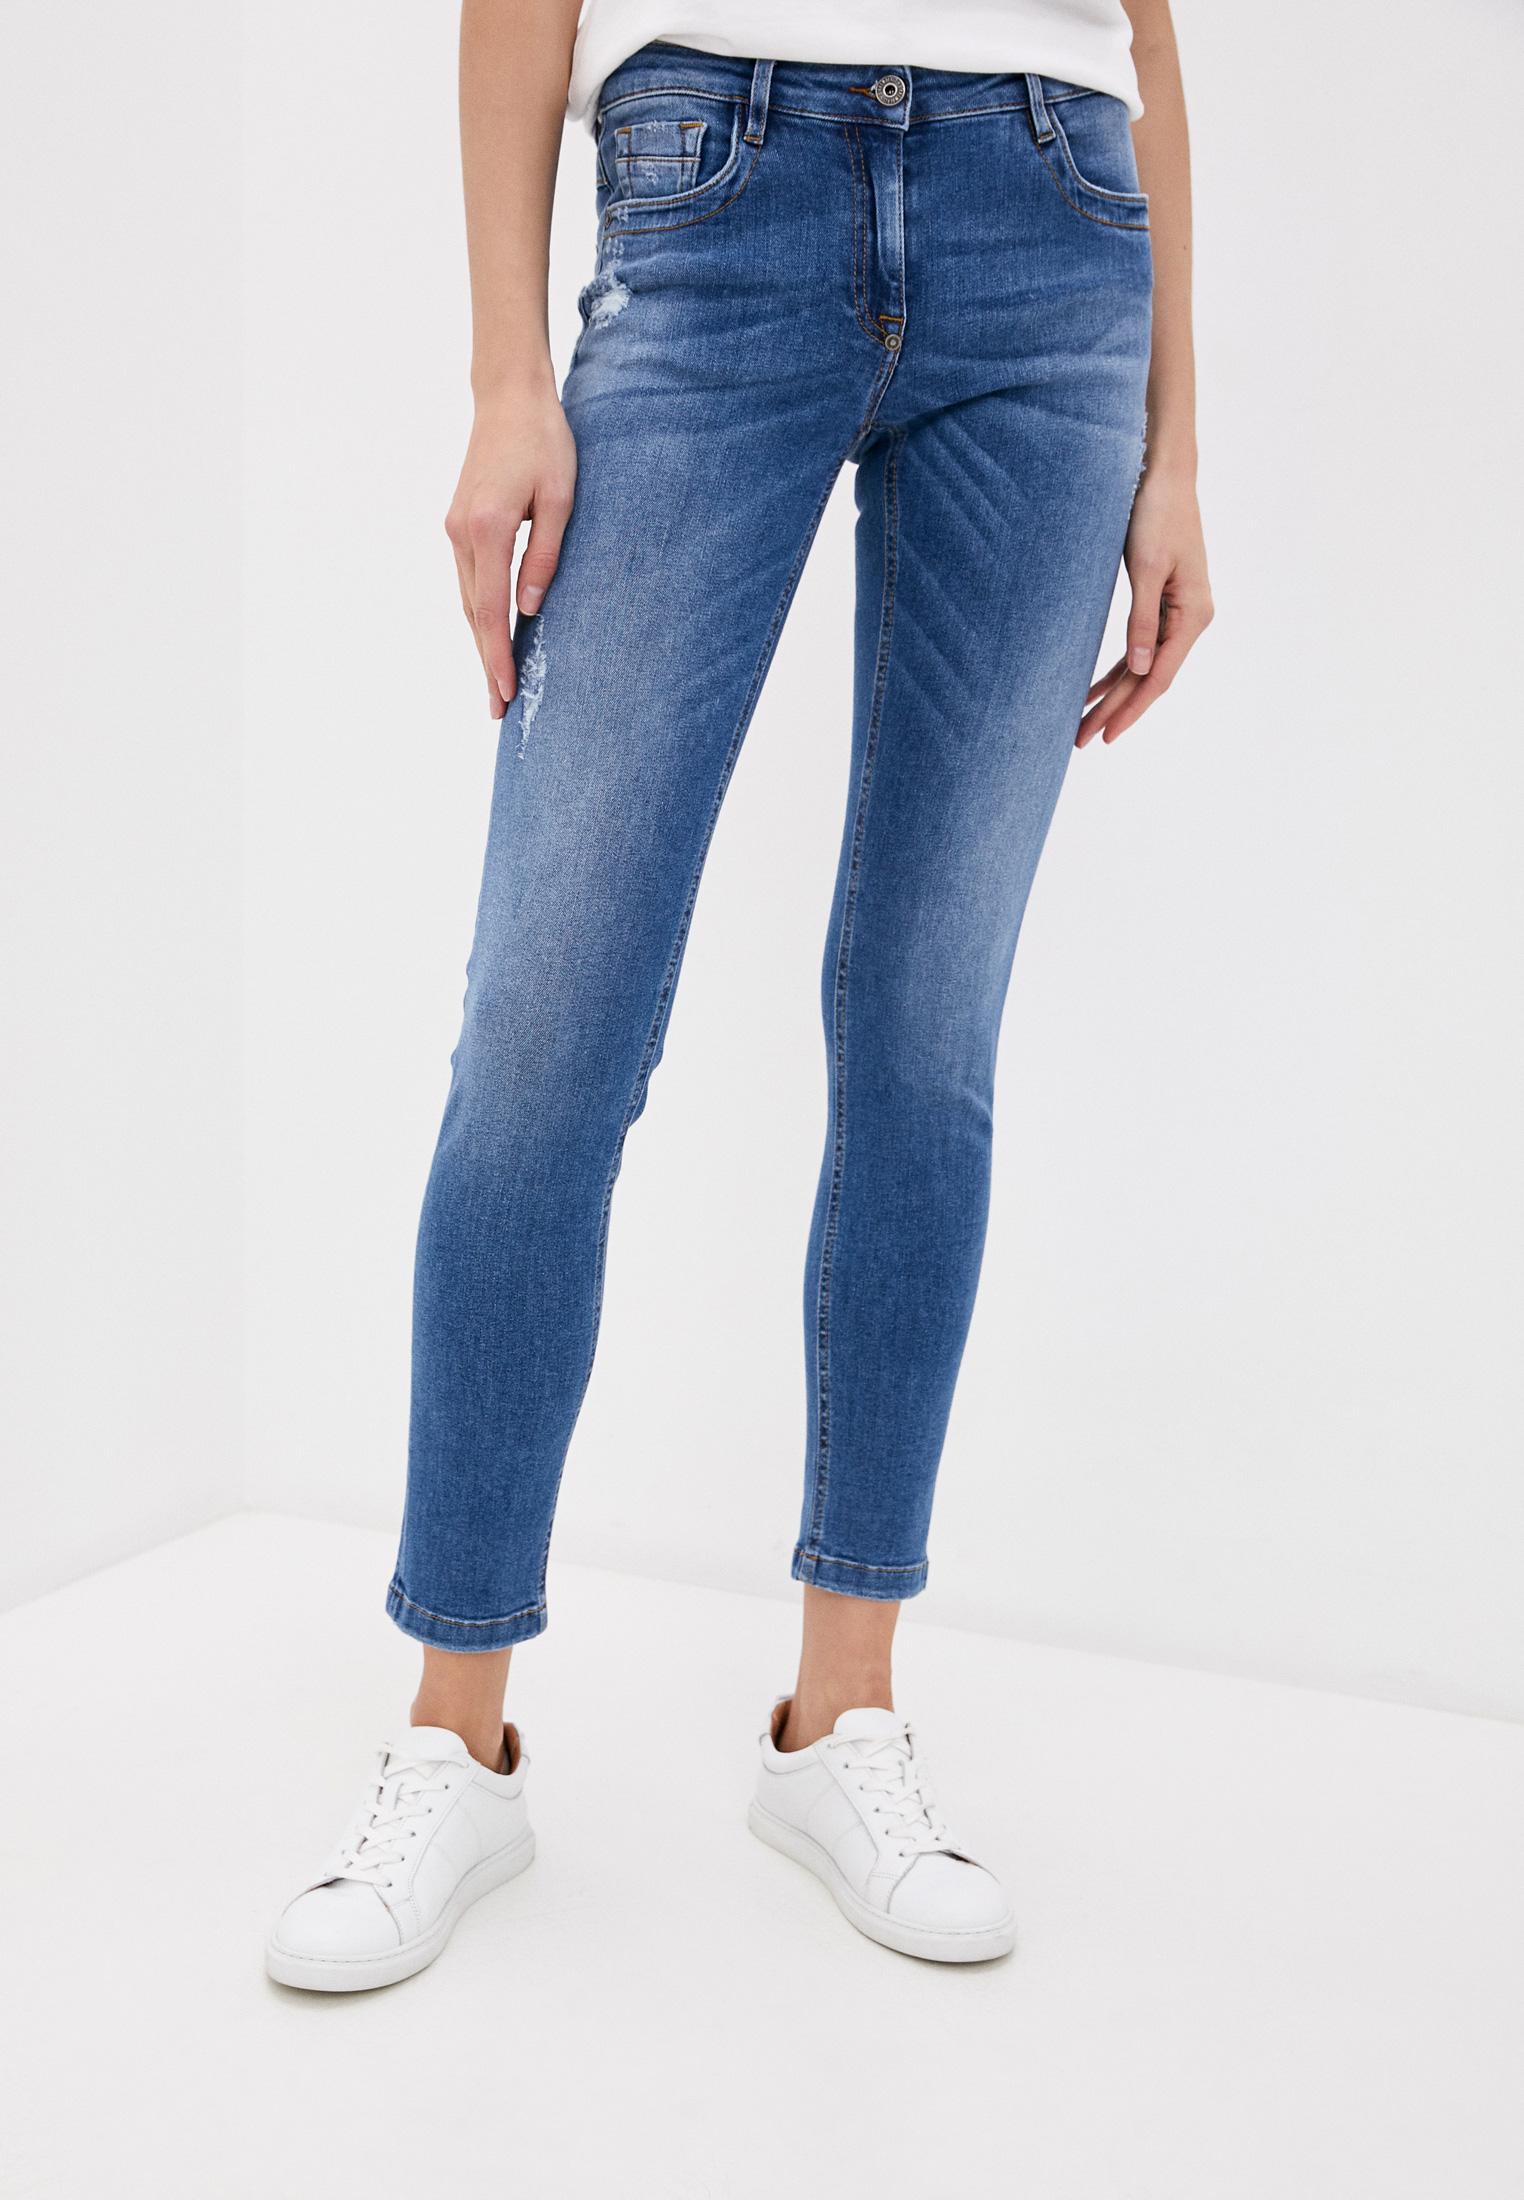 Зауженные джинсы Bikkembergs D Q 101 03 S 3418